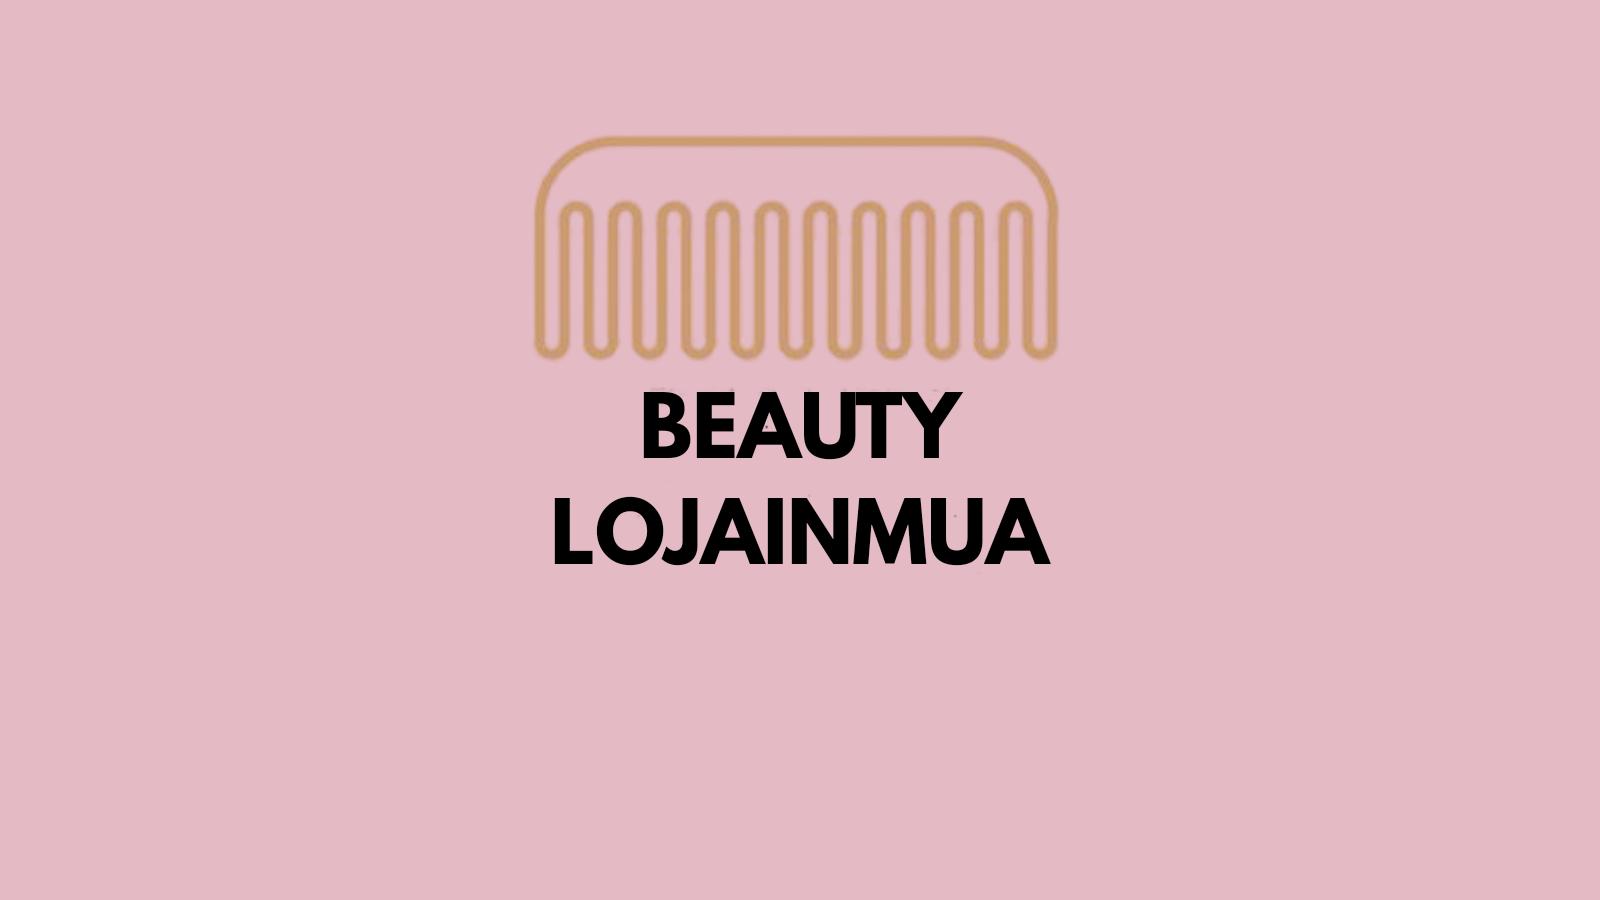 beauty lojainmu/m